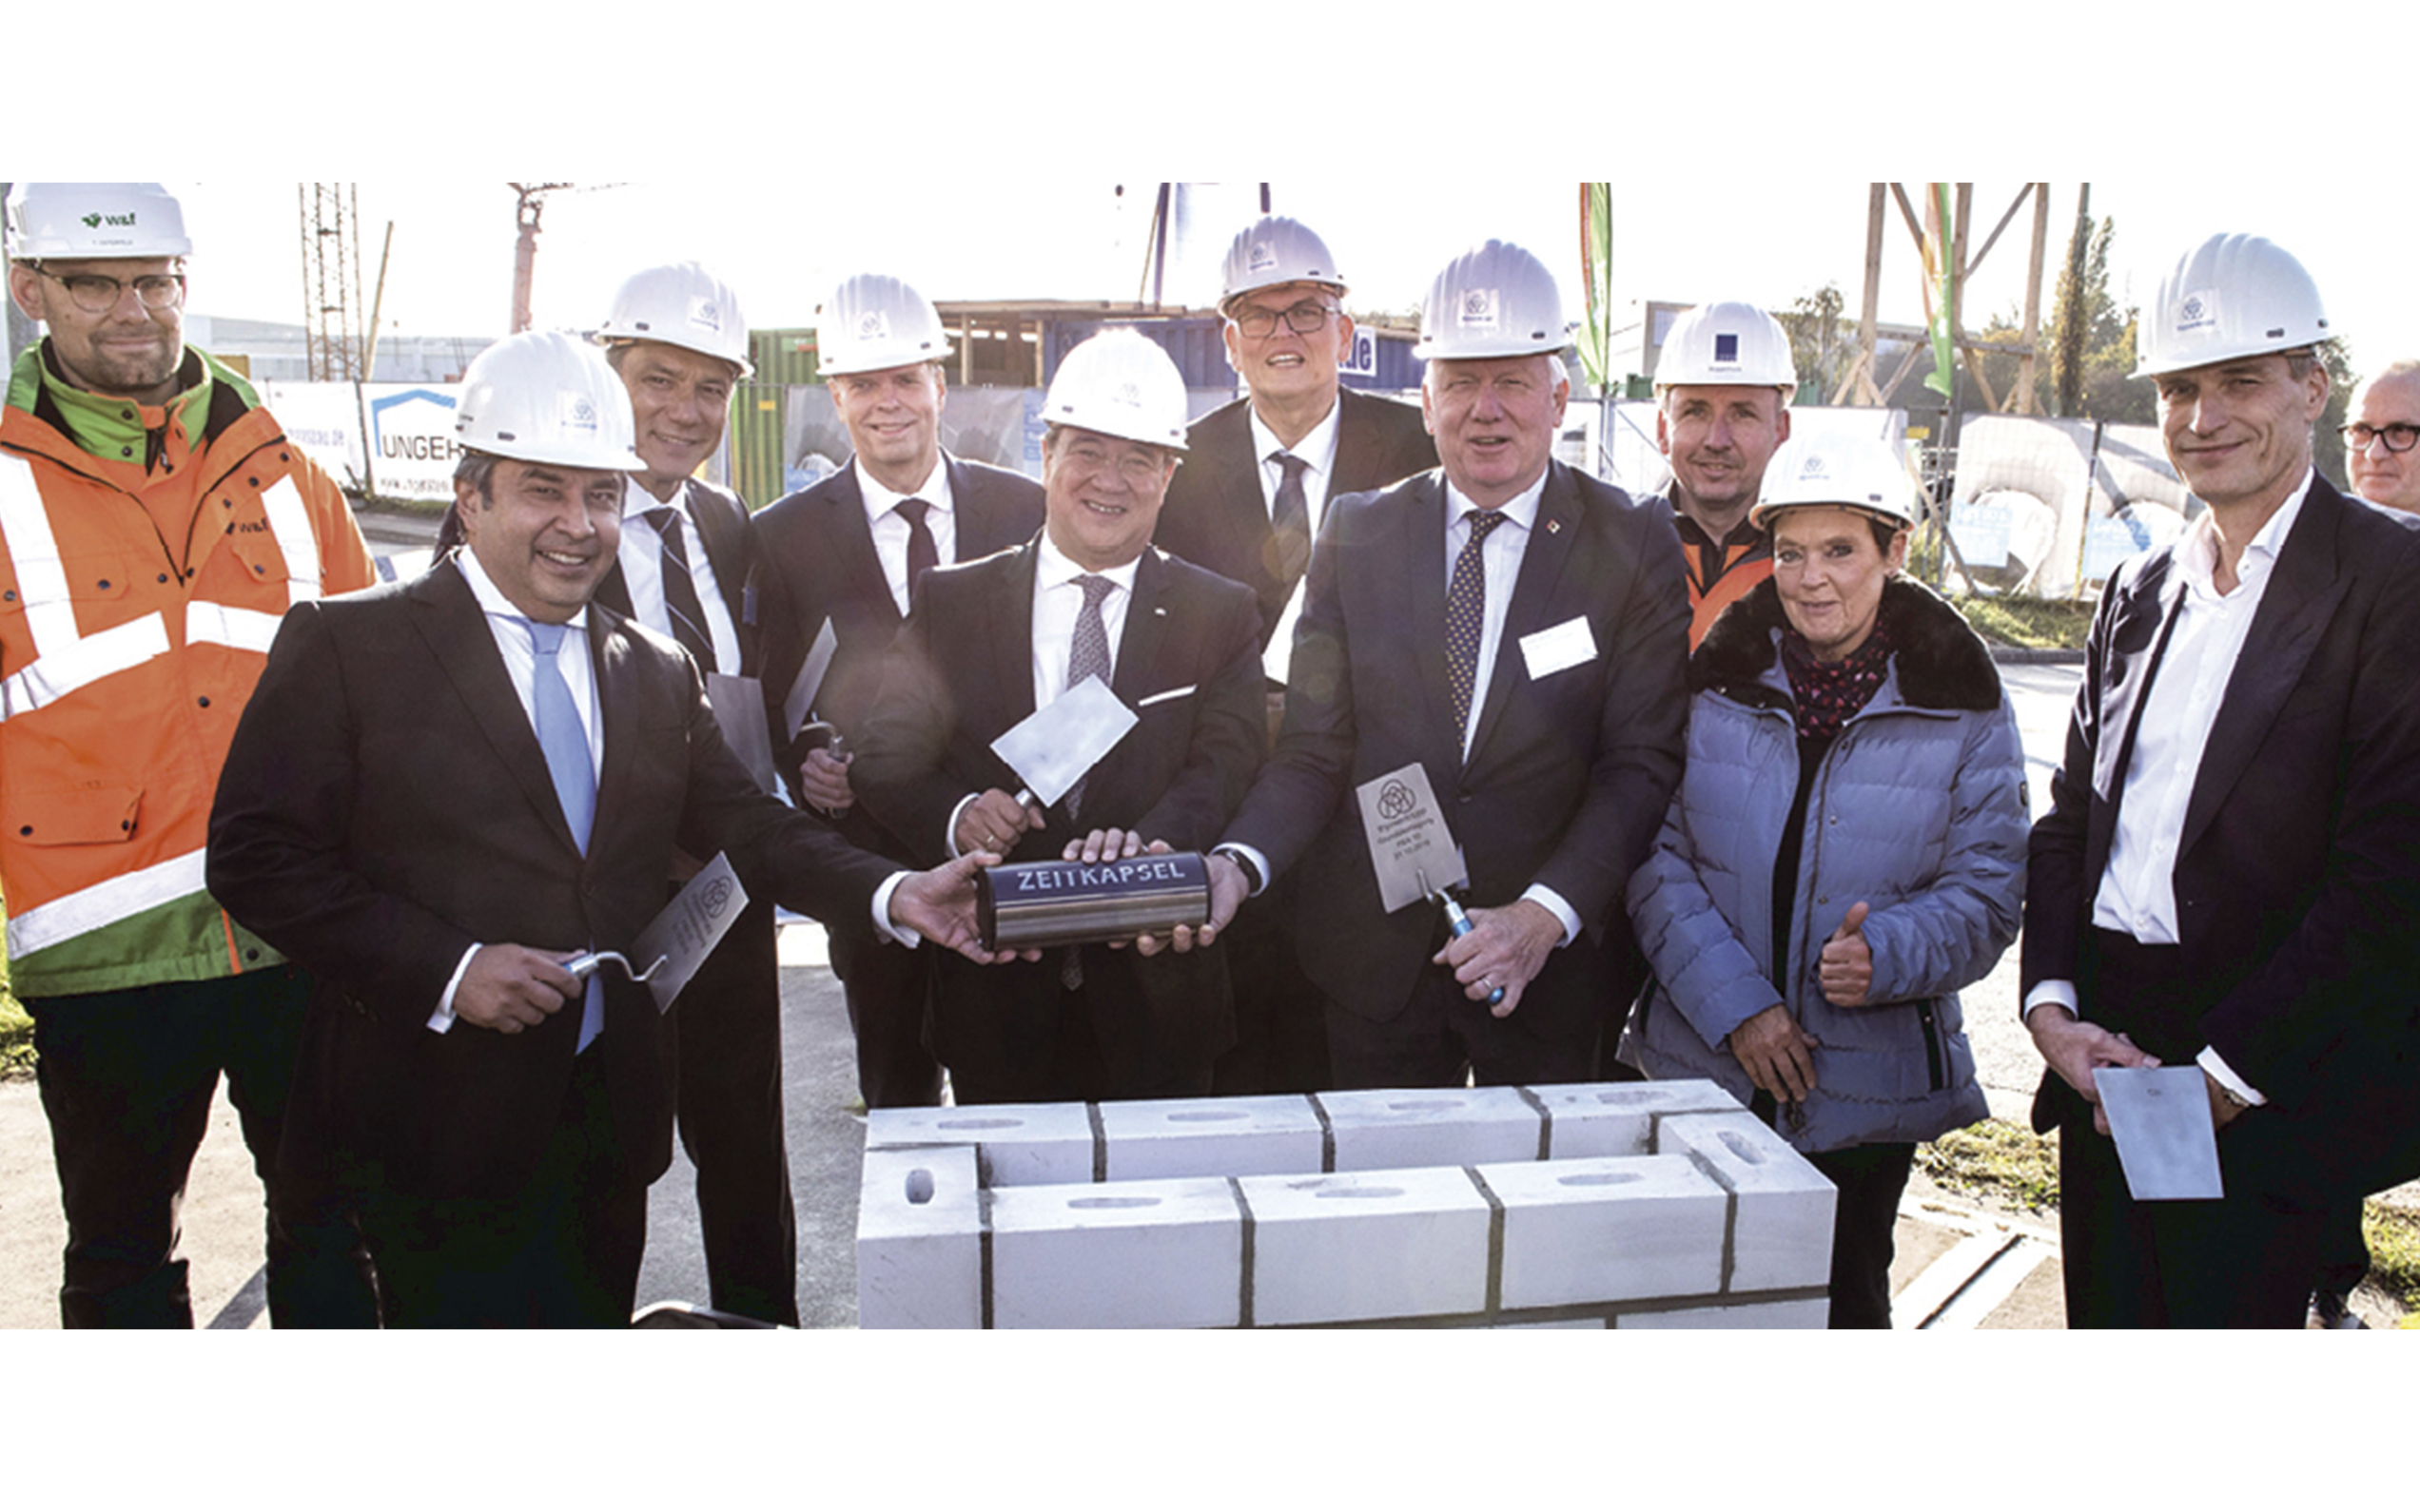 Thyssenkrupp Steel Nachrichten